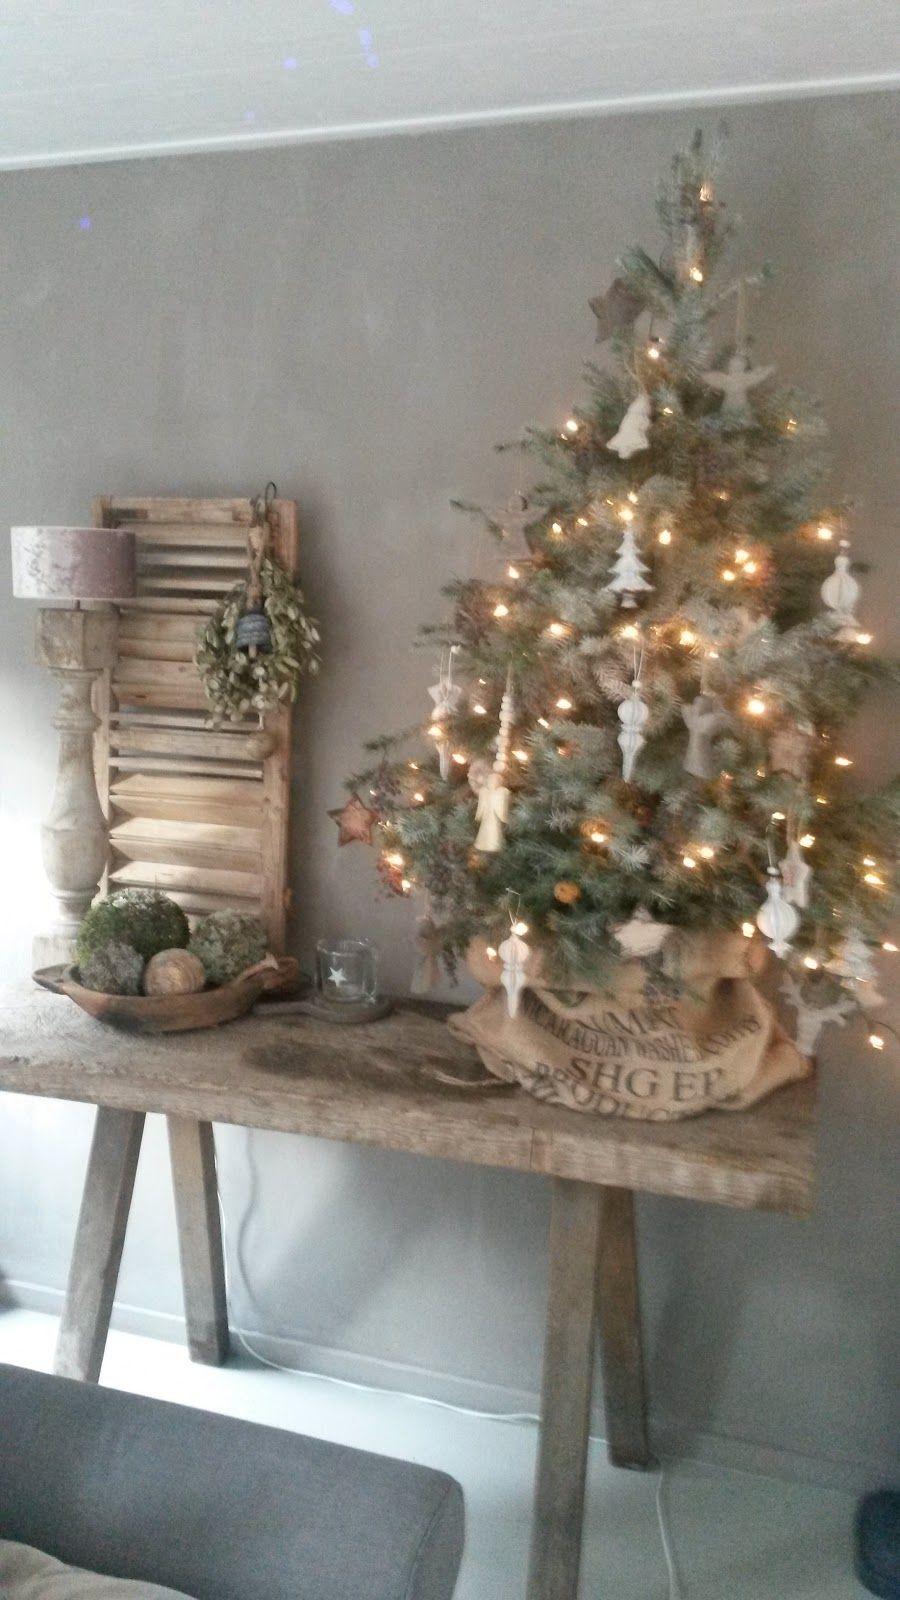 donkere dagen voor kerst kerst winter diy pinterest. Black Bedroom Furniture Sets. Home Design Ideas